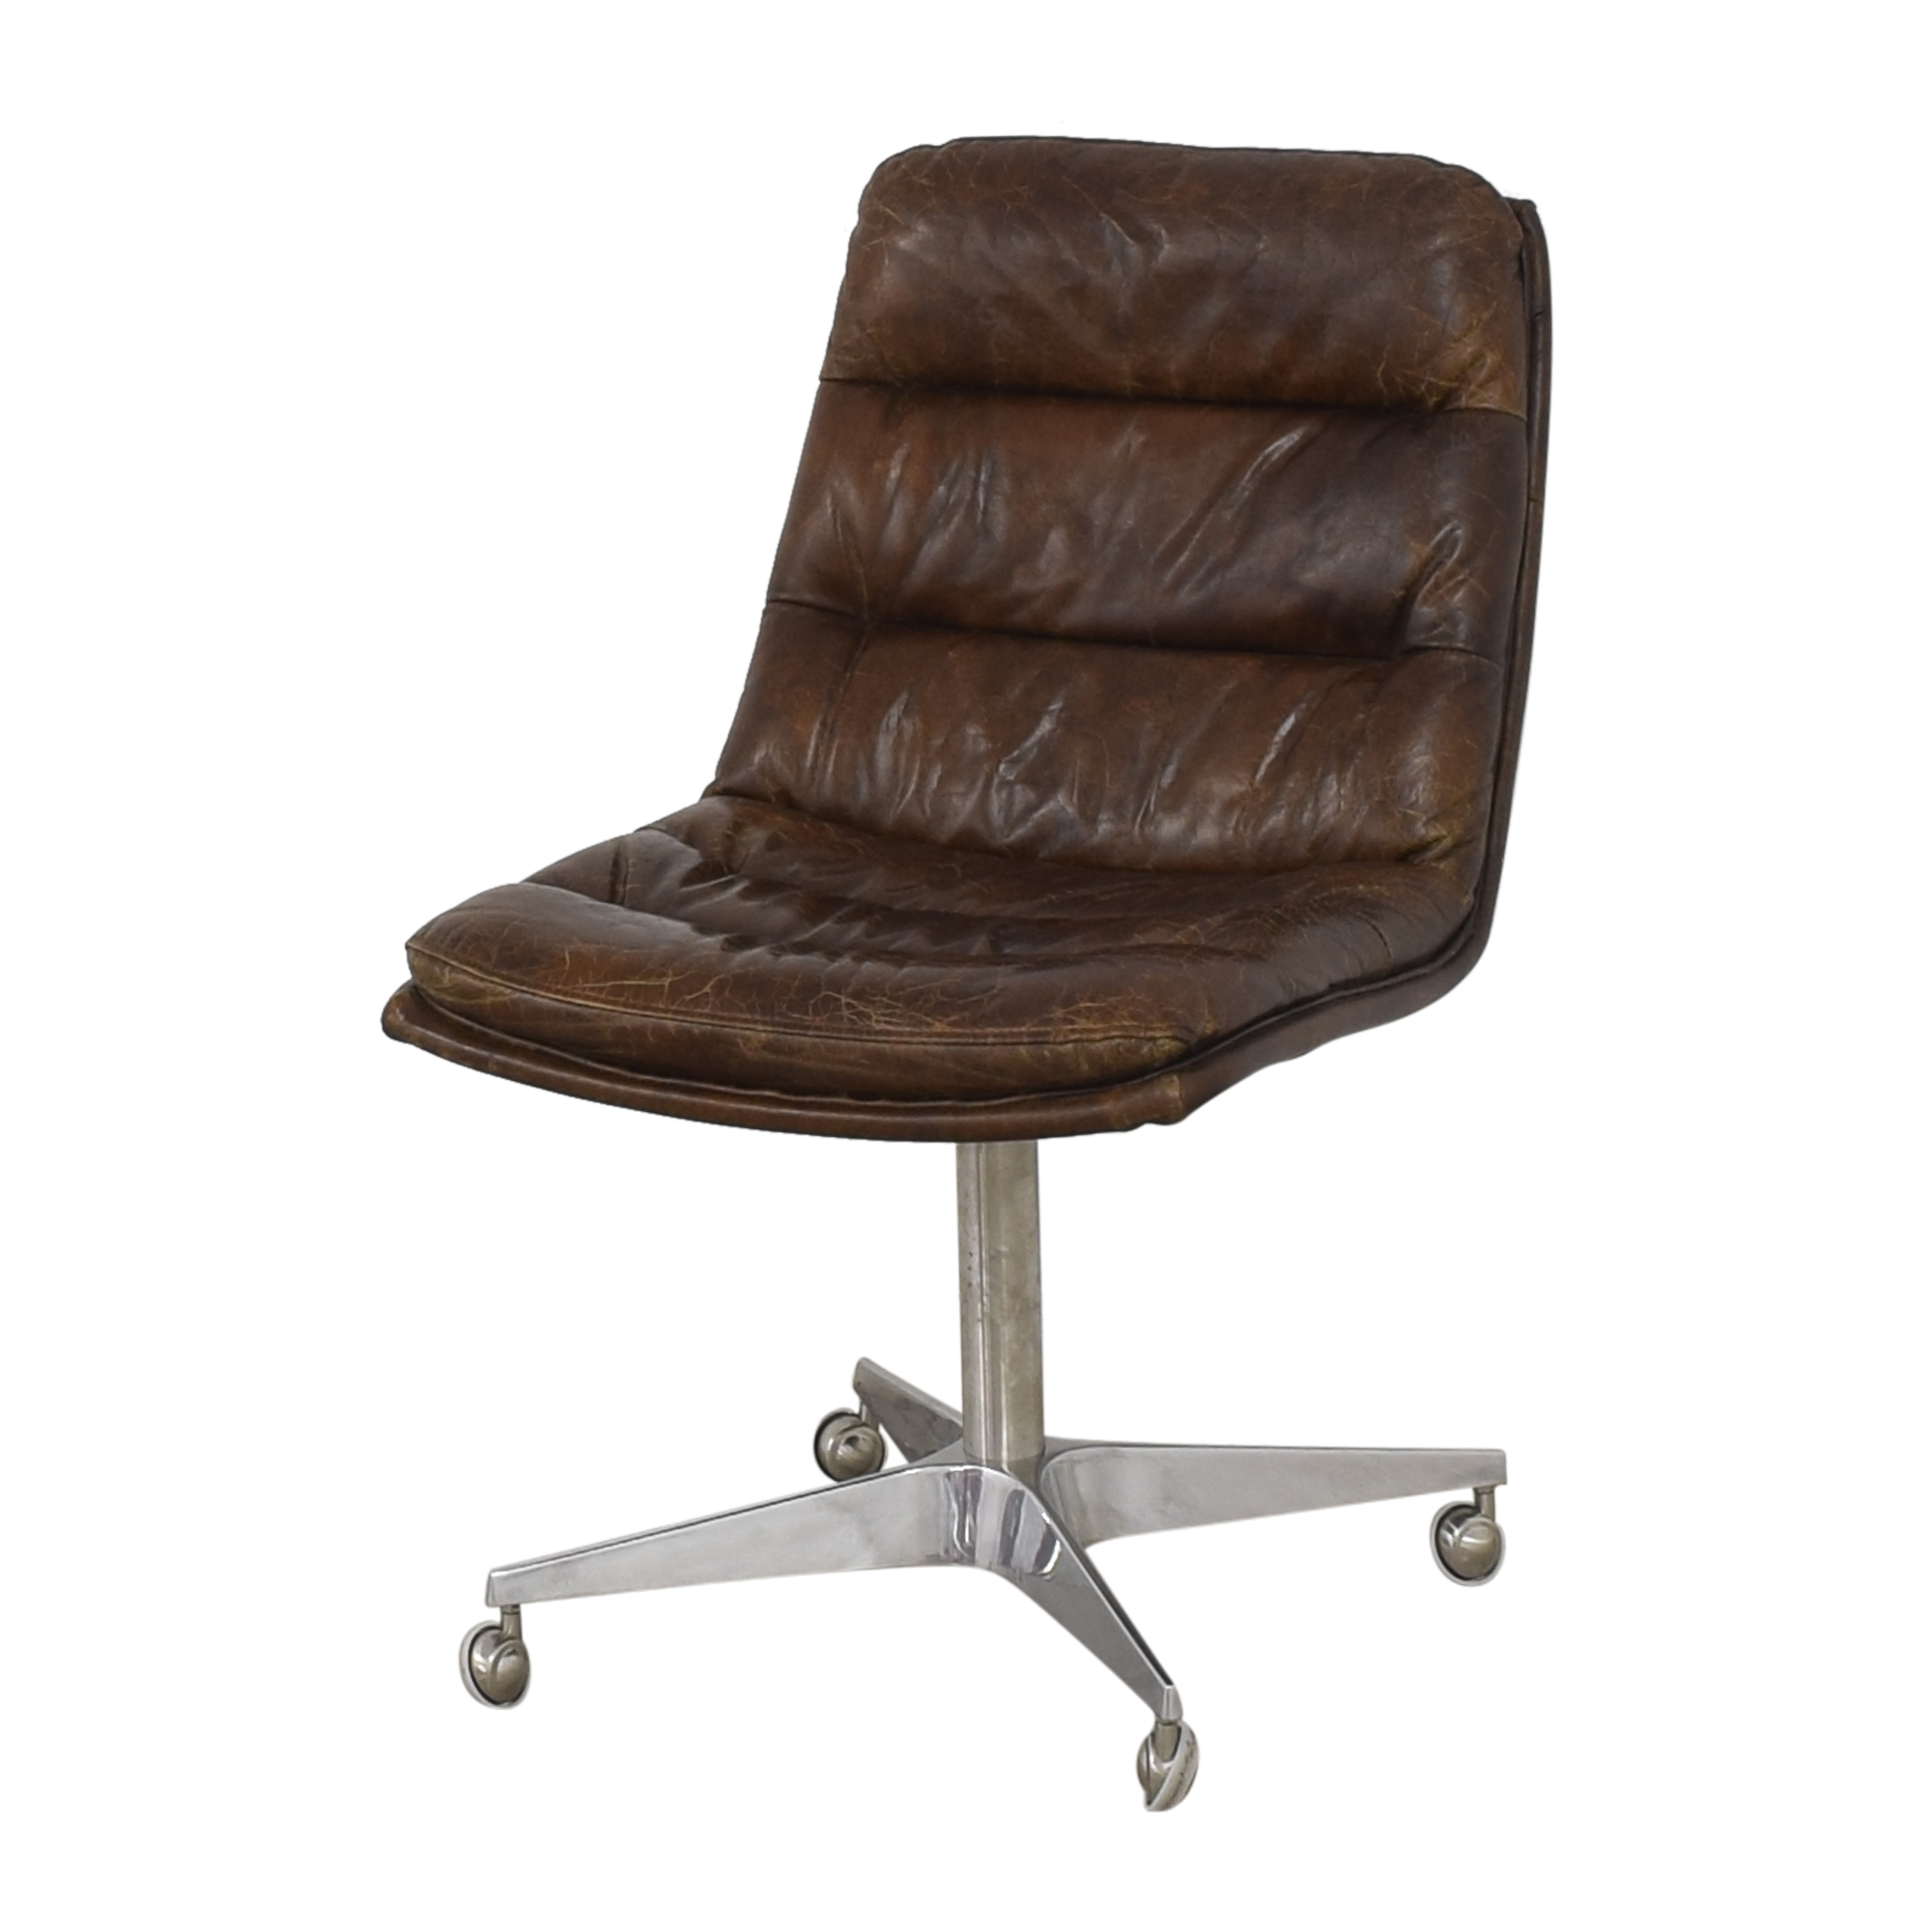 Restoration Hardware Griffith Desk Chair  sale